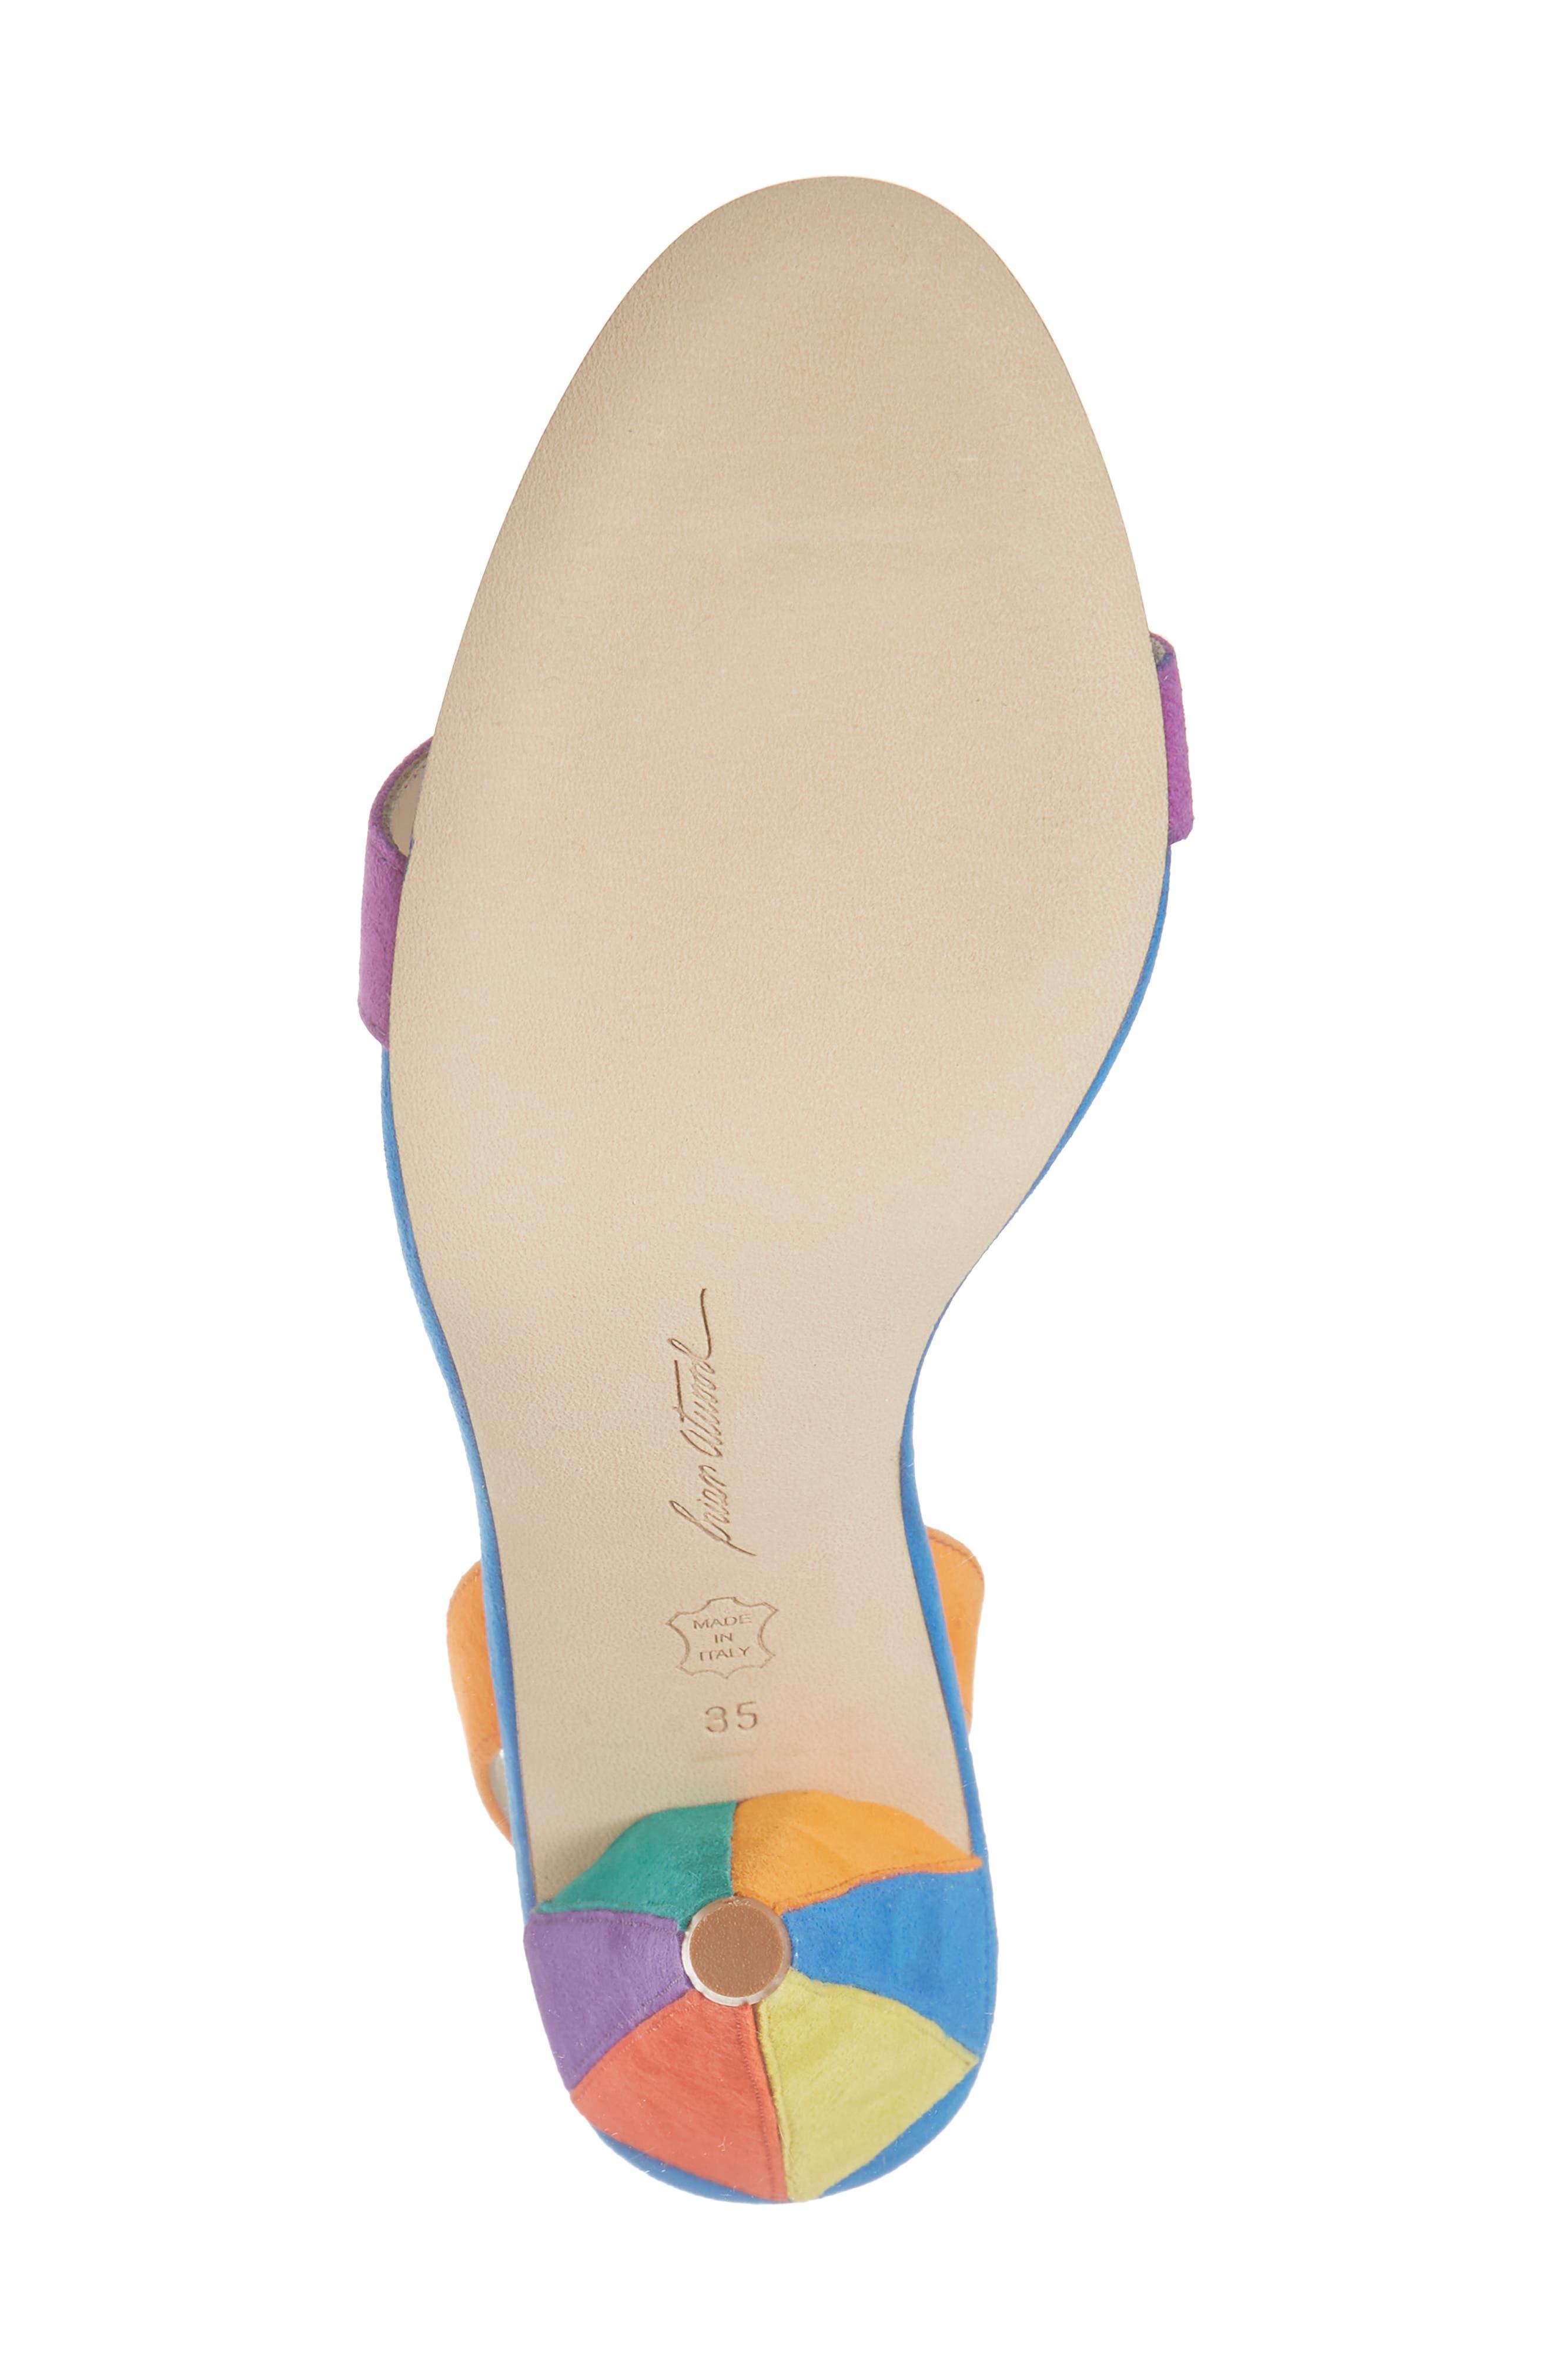 Susii Cone Heel Sandal,                             Alternate thumbnail 6, color,                             400